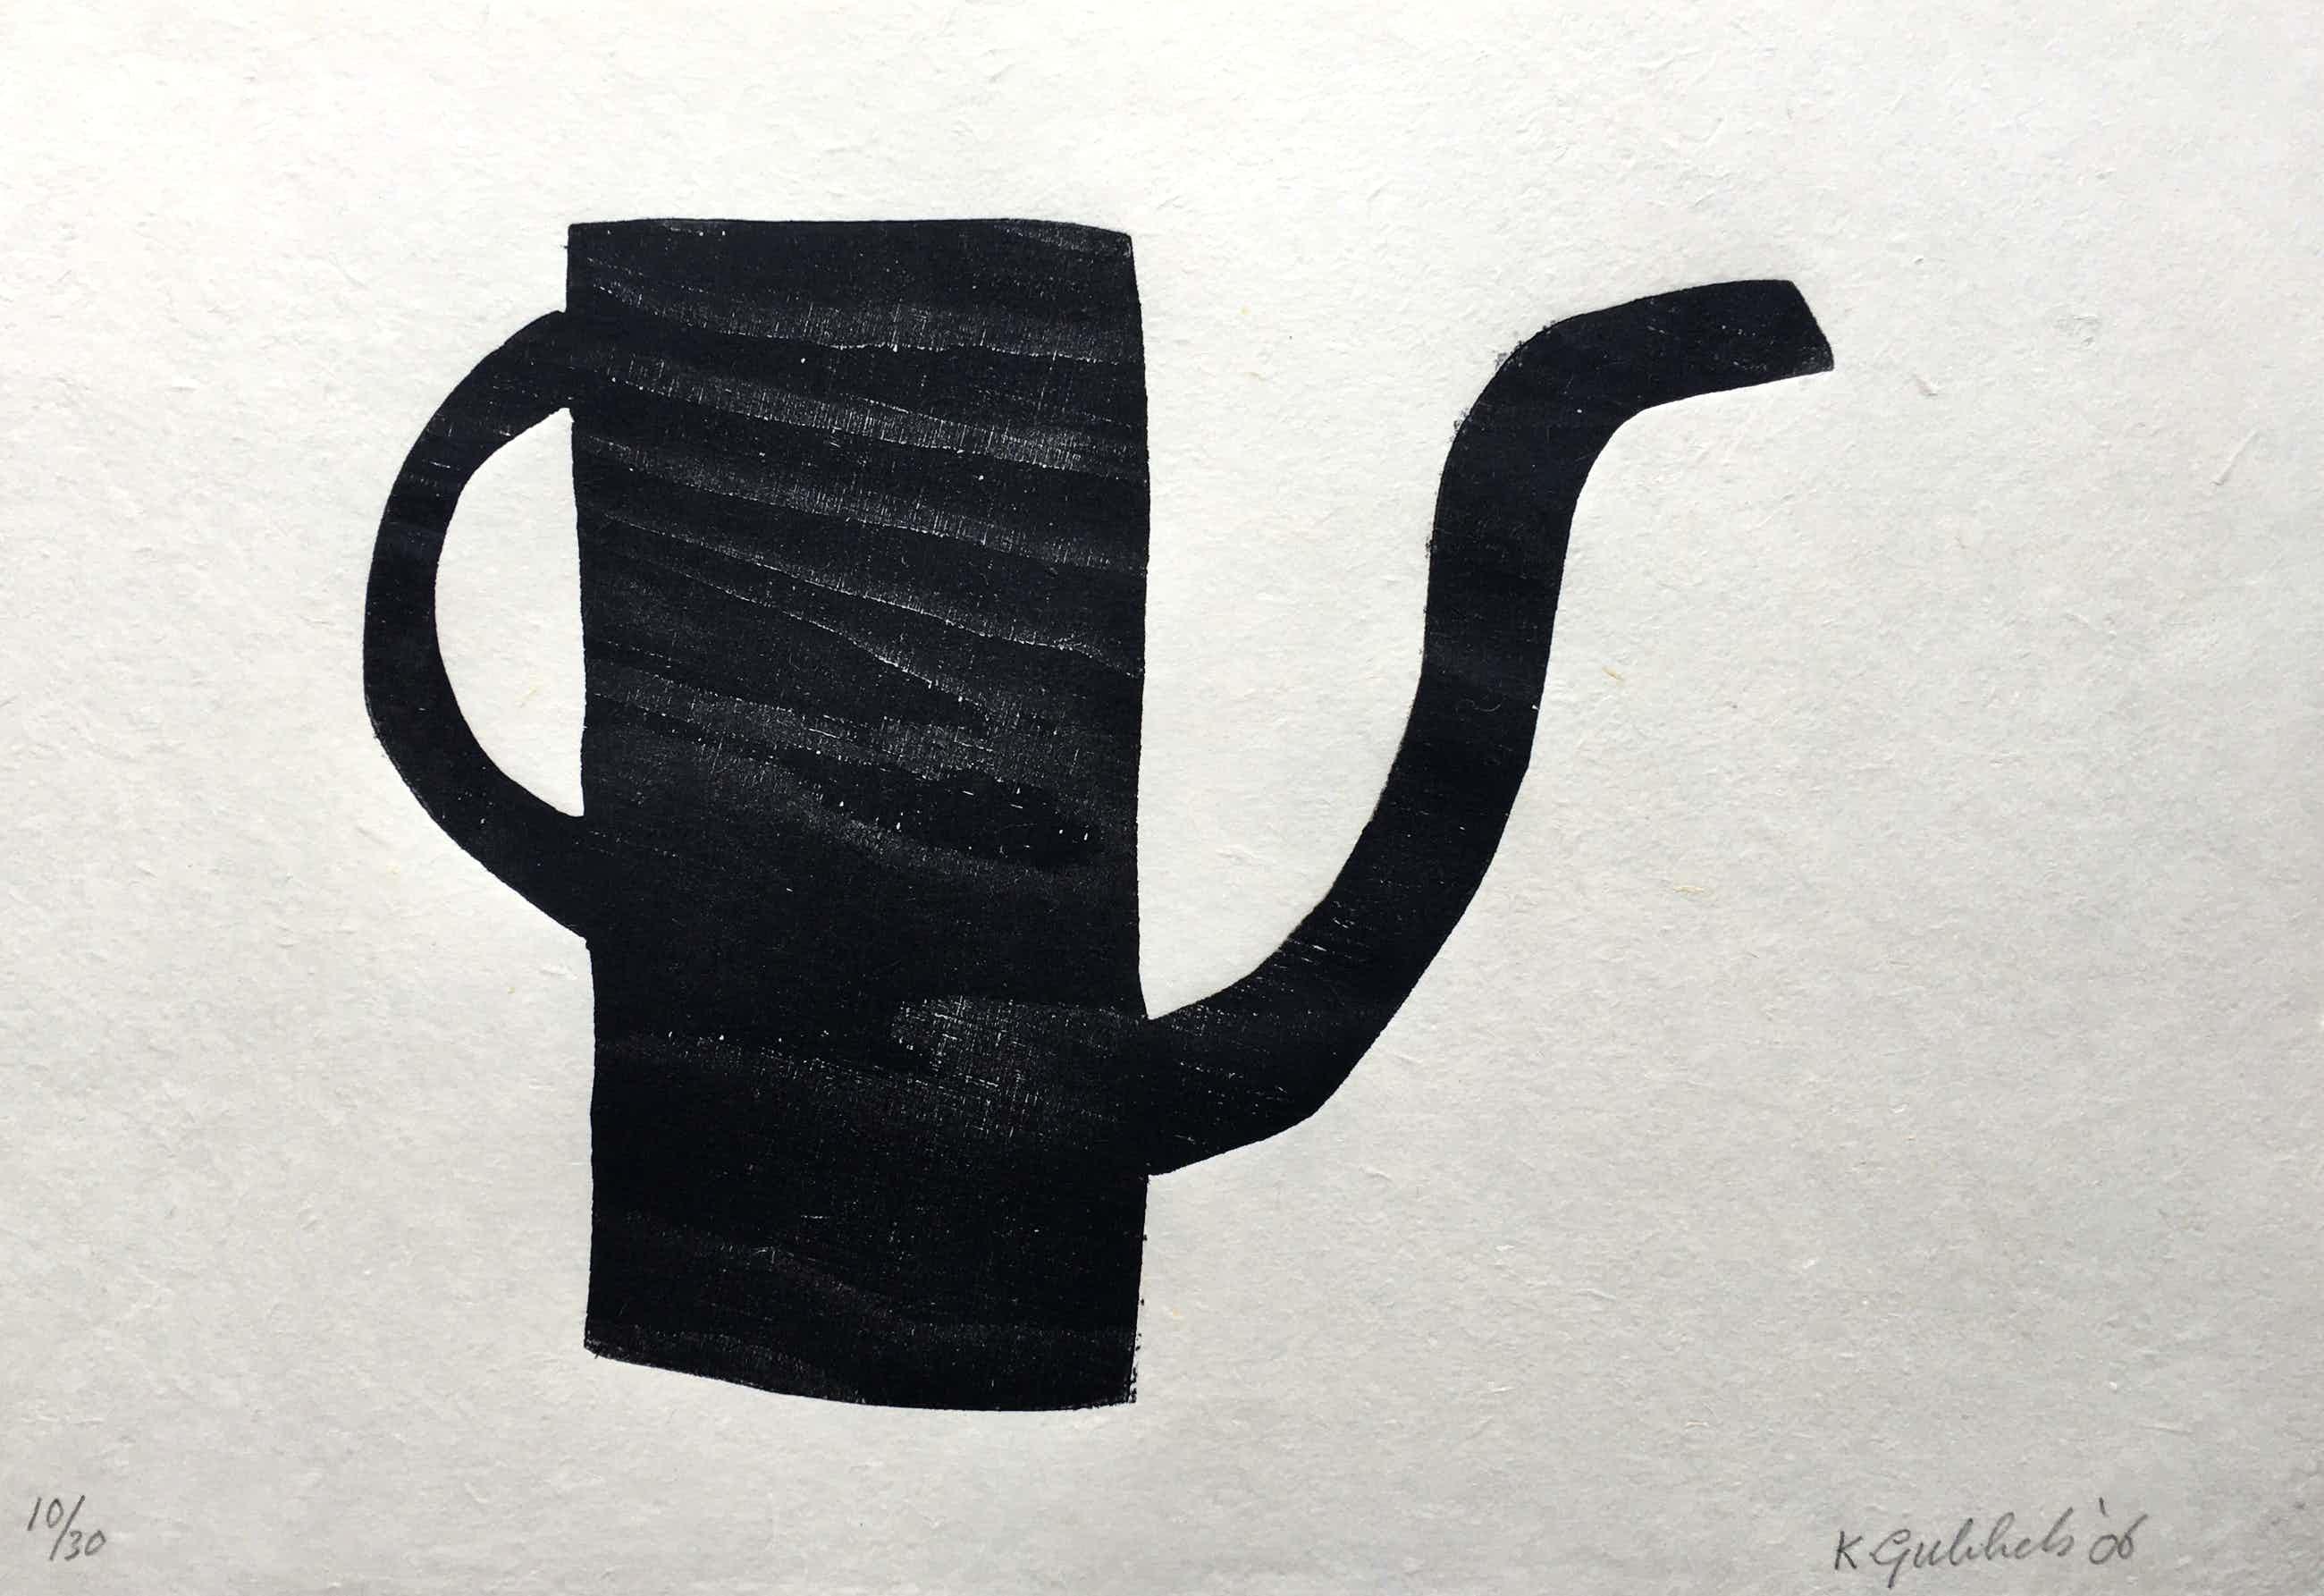 Klaas Gubbels - houtdruk 'Zwarte kan ' - 2006 - oplage 30 kopen? Bied vanaf 375!